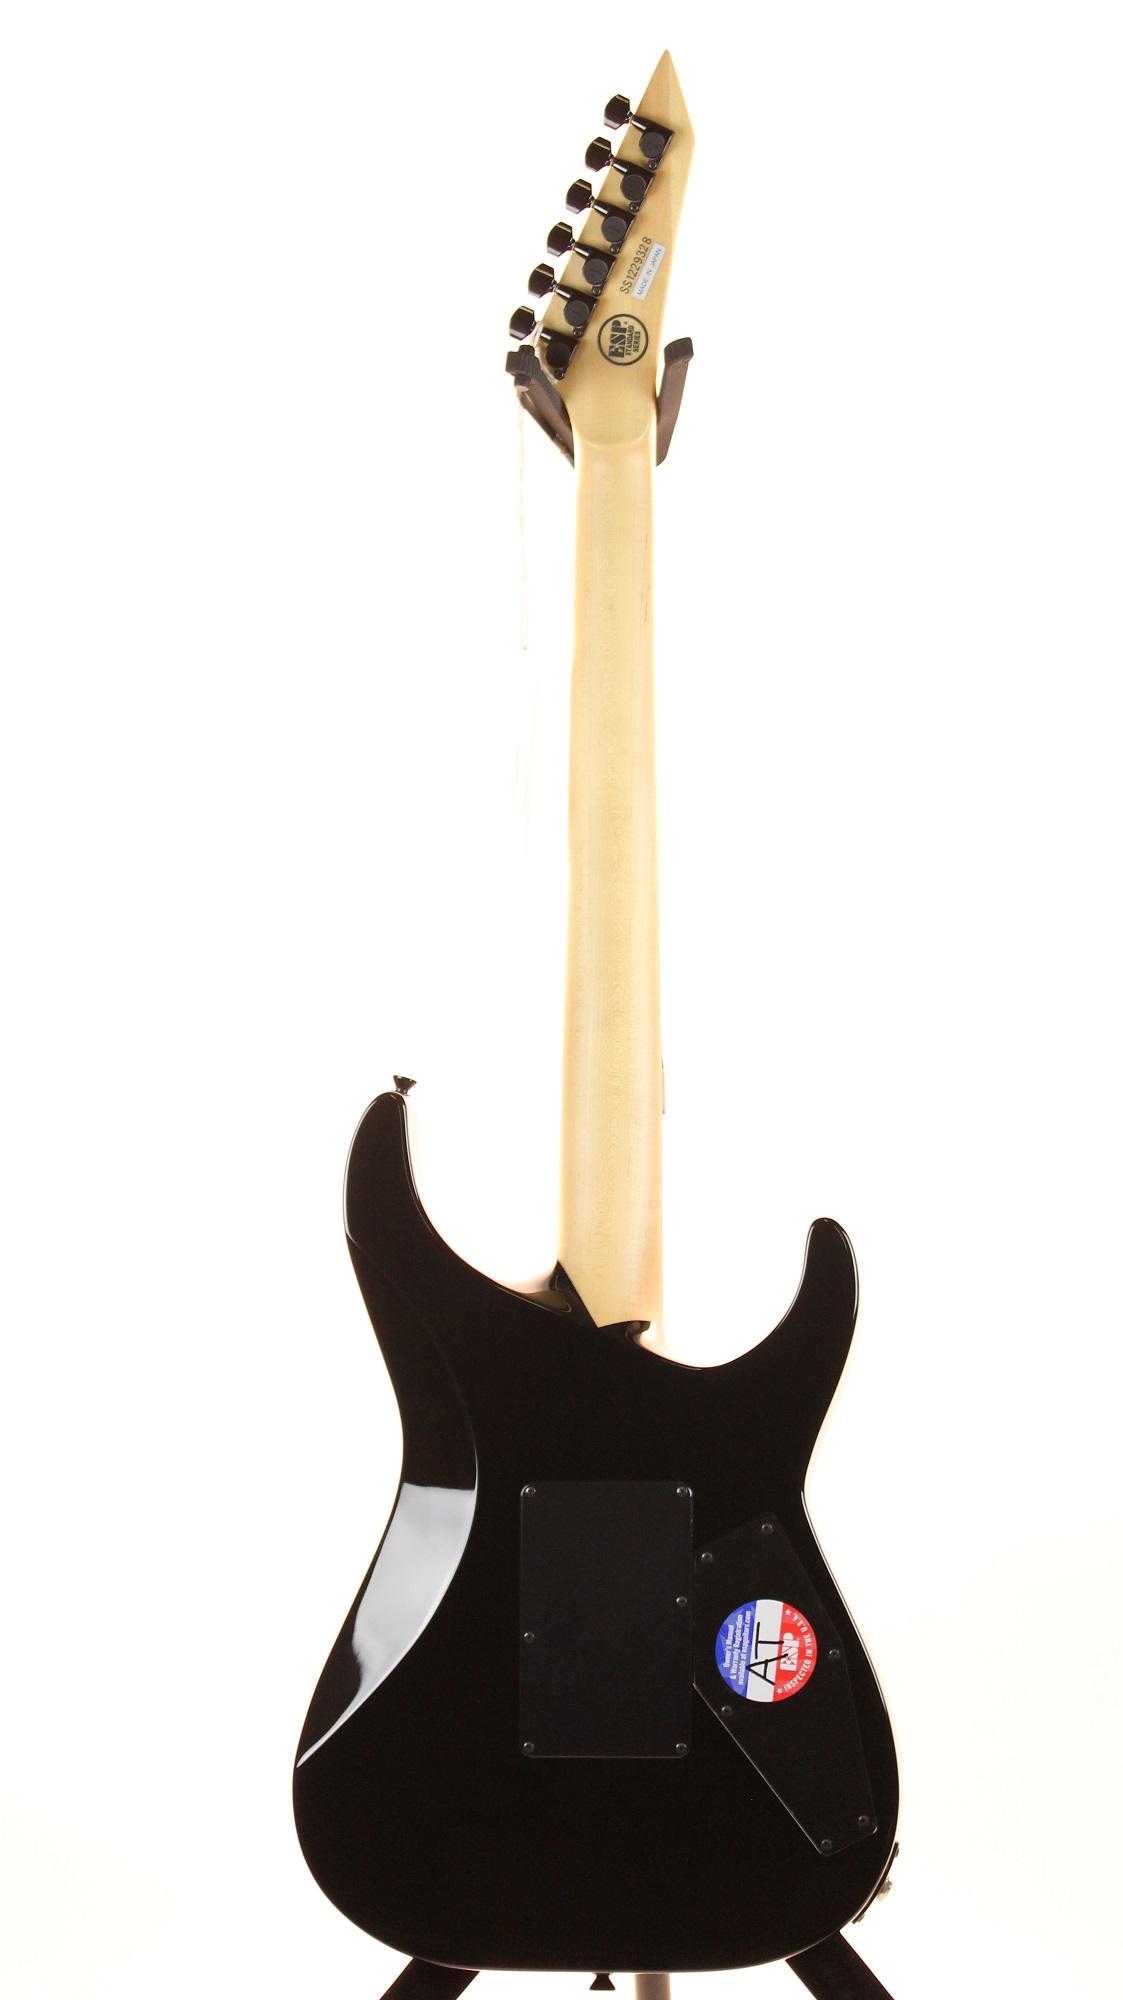 esp mii ntb black left handed electric guitar 6stringcom